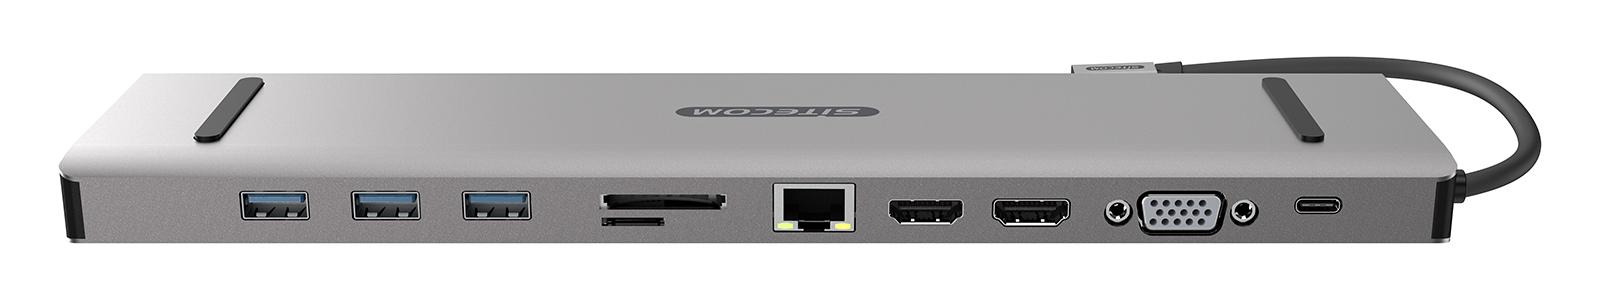 Sitecom USB-C Multiport Pro Dock, il dock elegante e utile per MacBook Pro